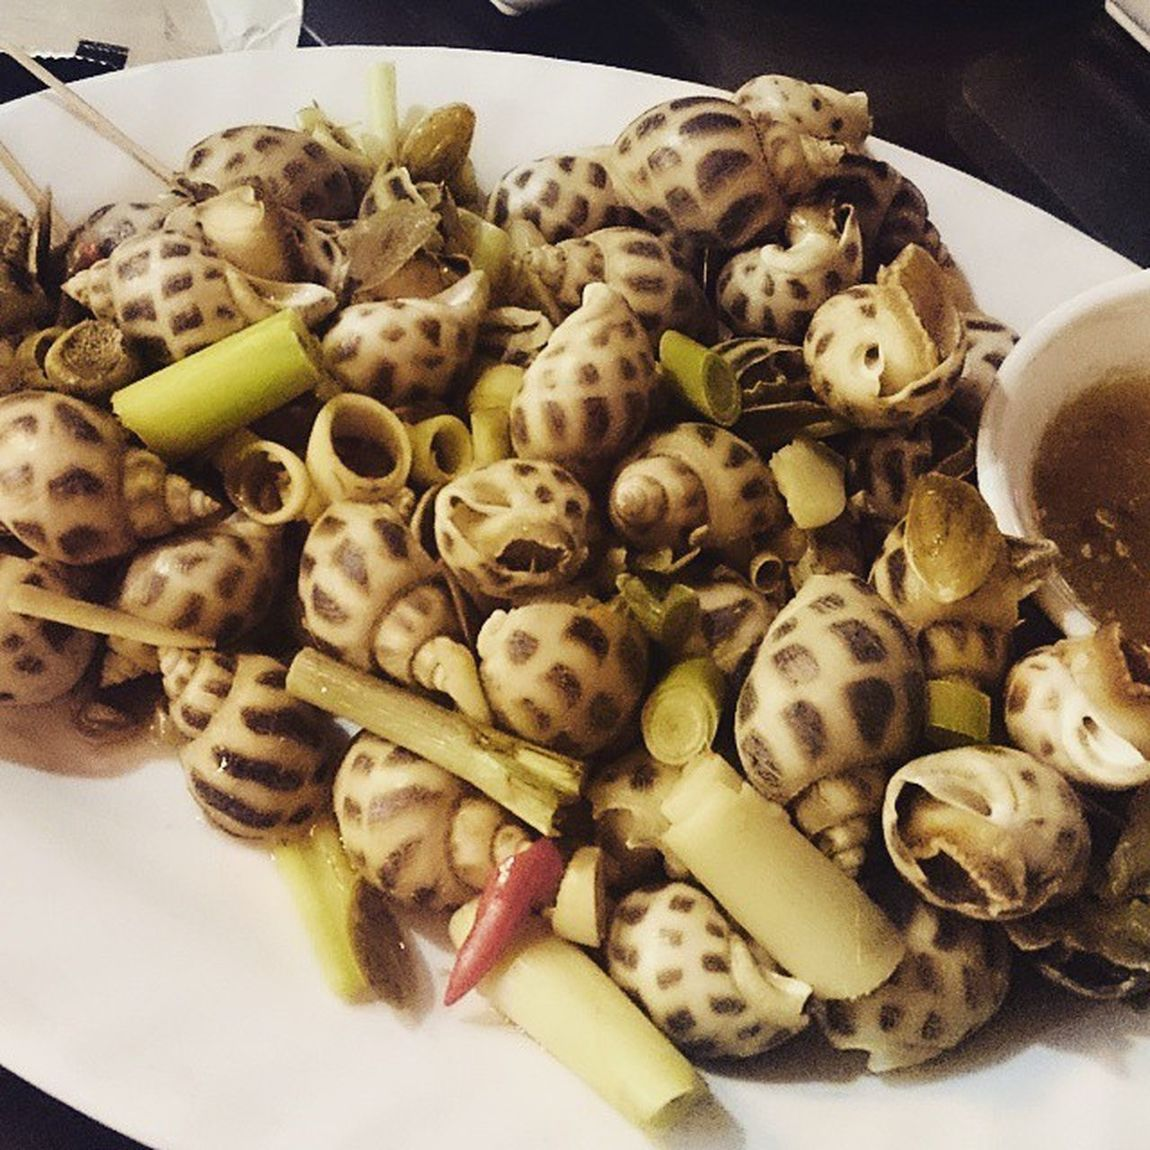 Hảisản Ochuong Foody Lozidanang amthucdathanh delicious